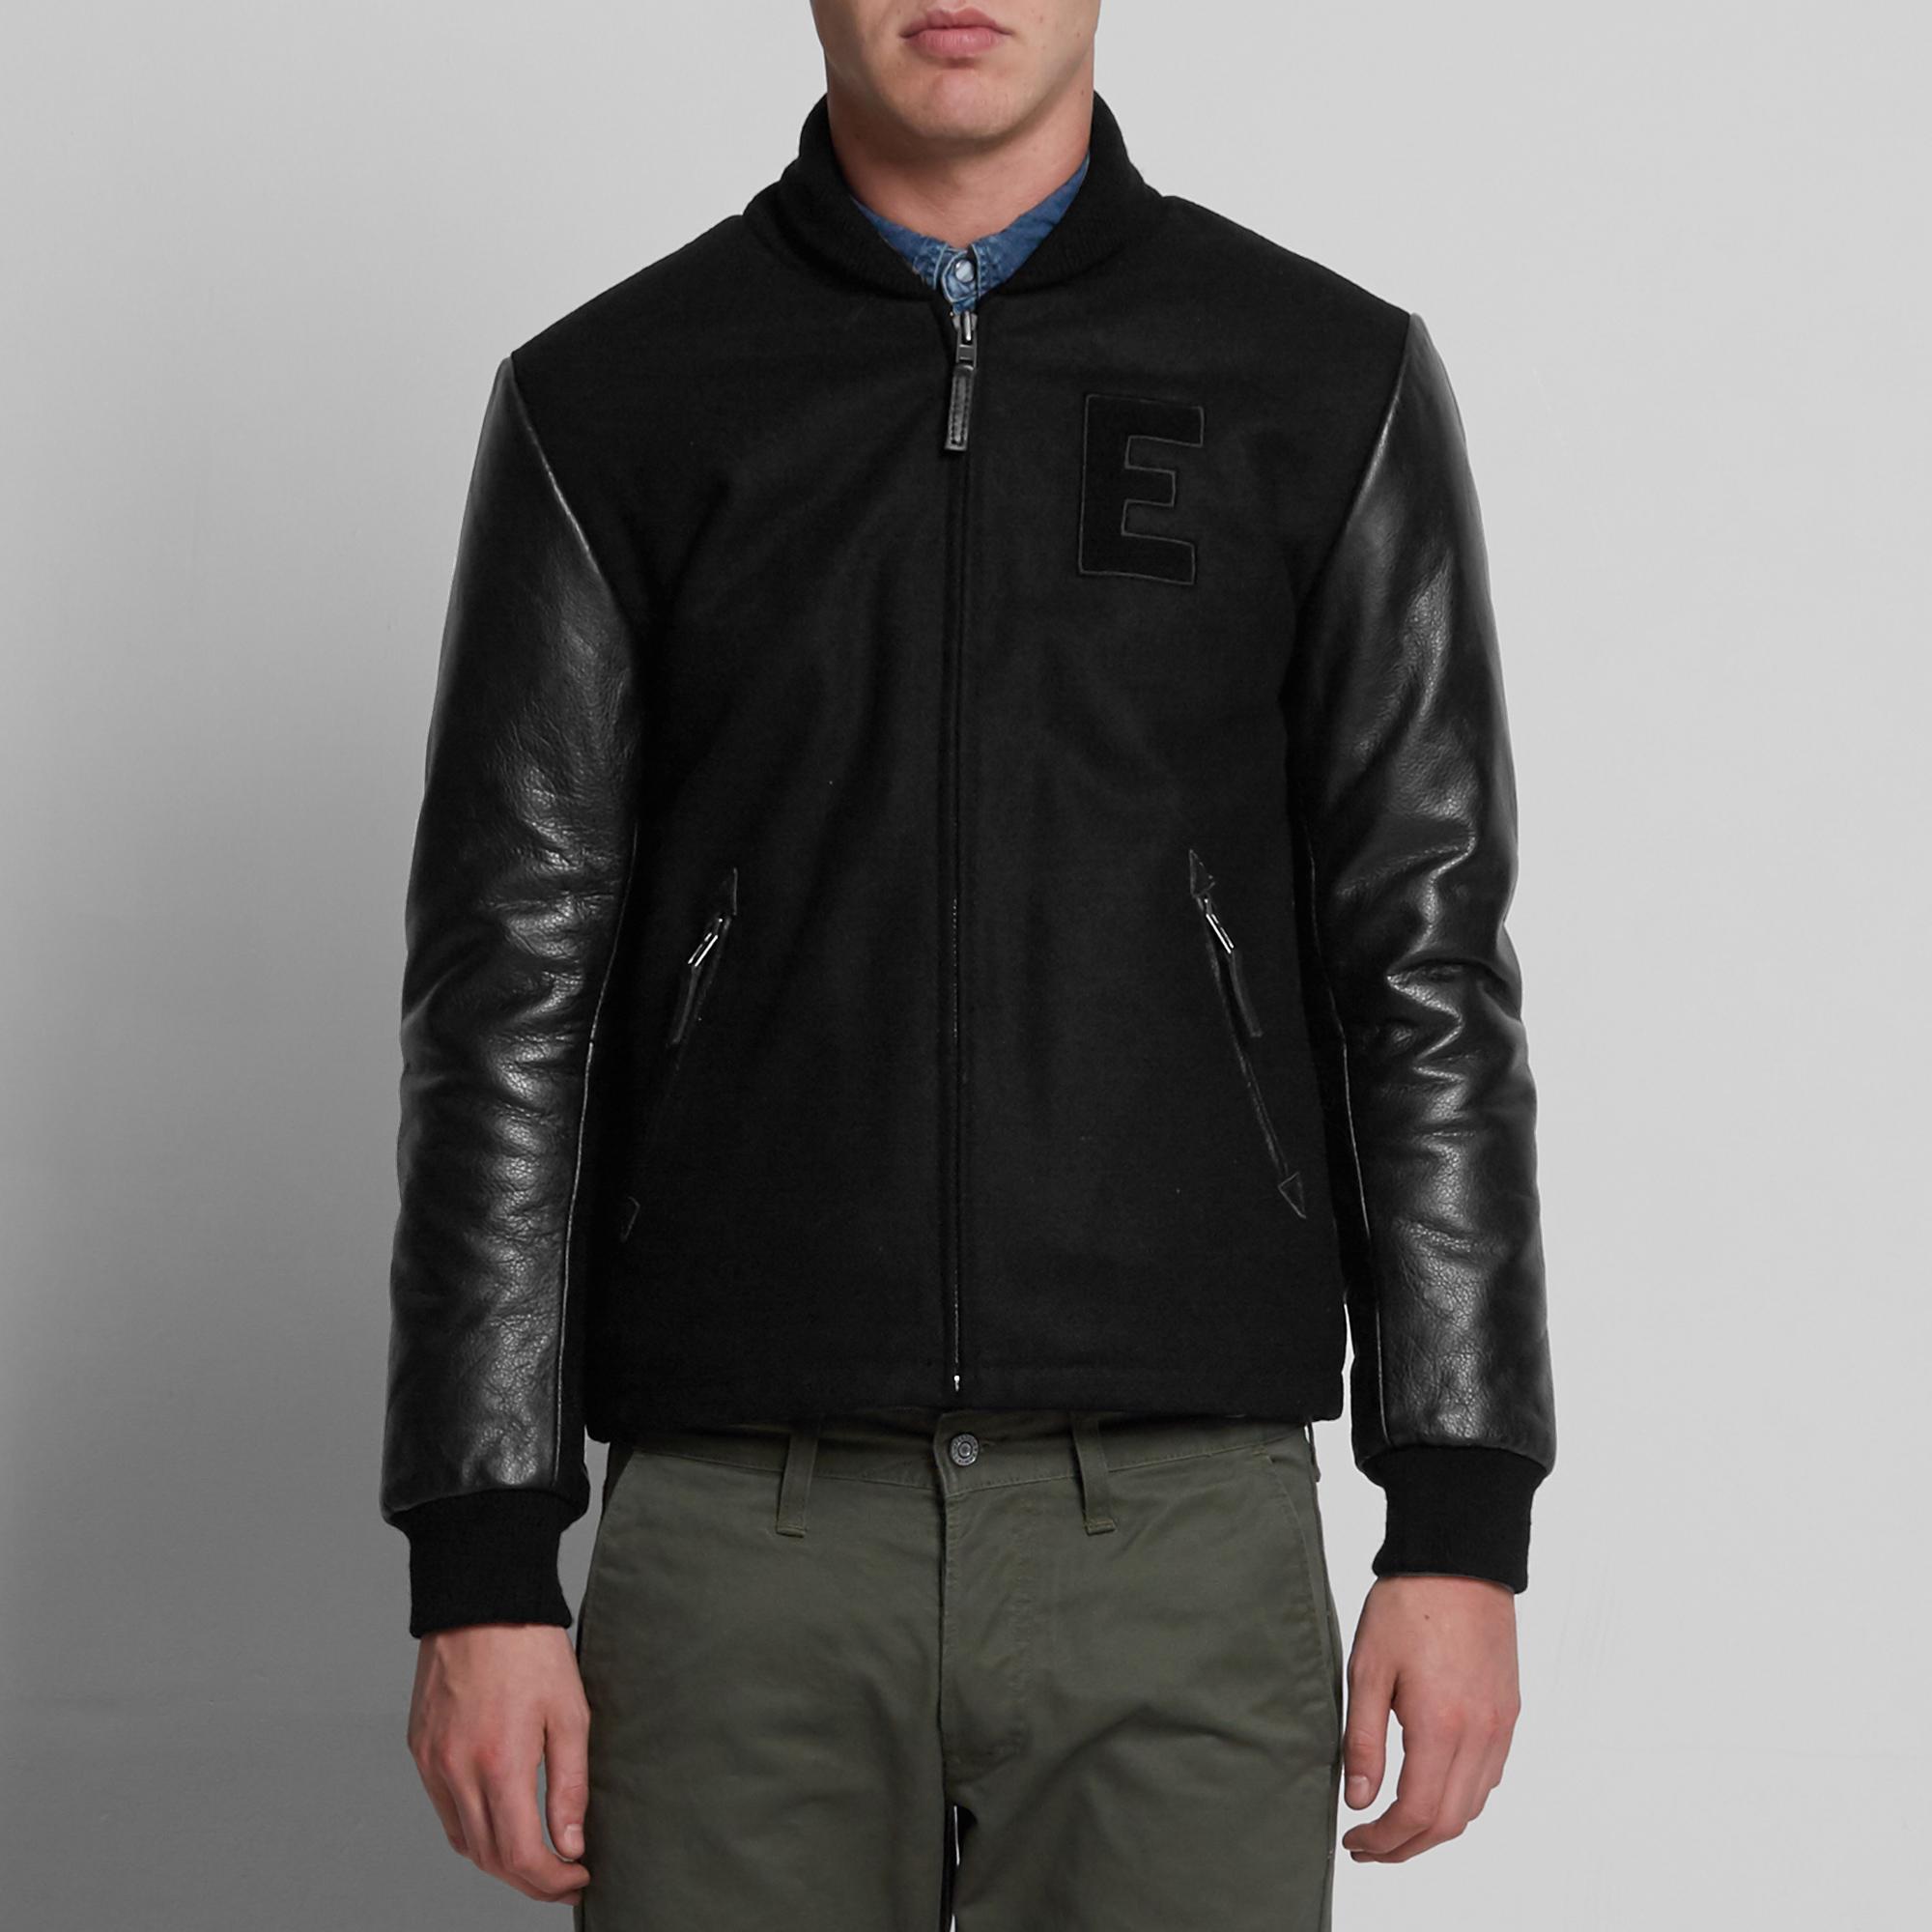 Edwin Baseball Jacket (Black)